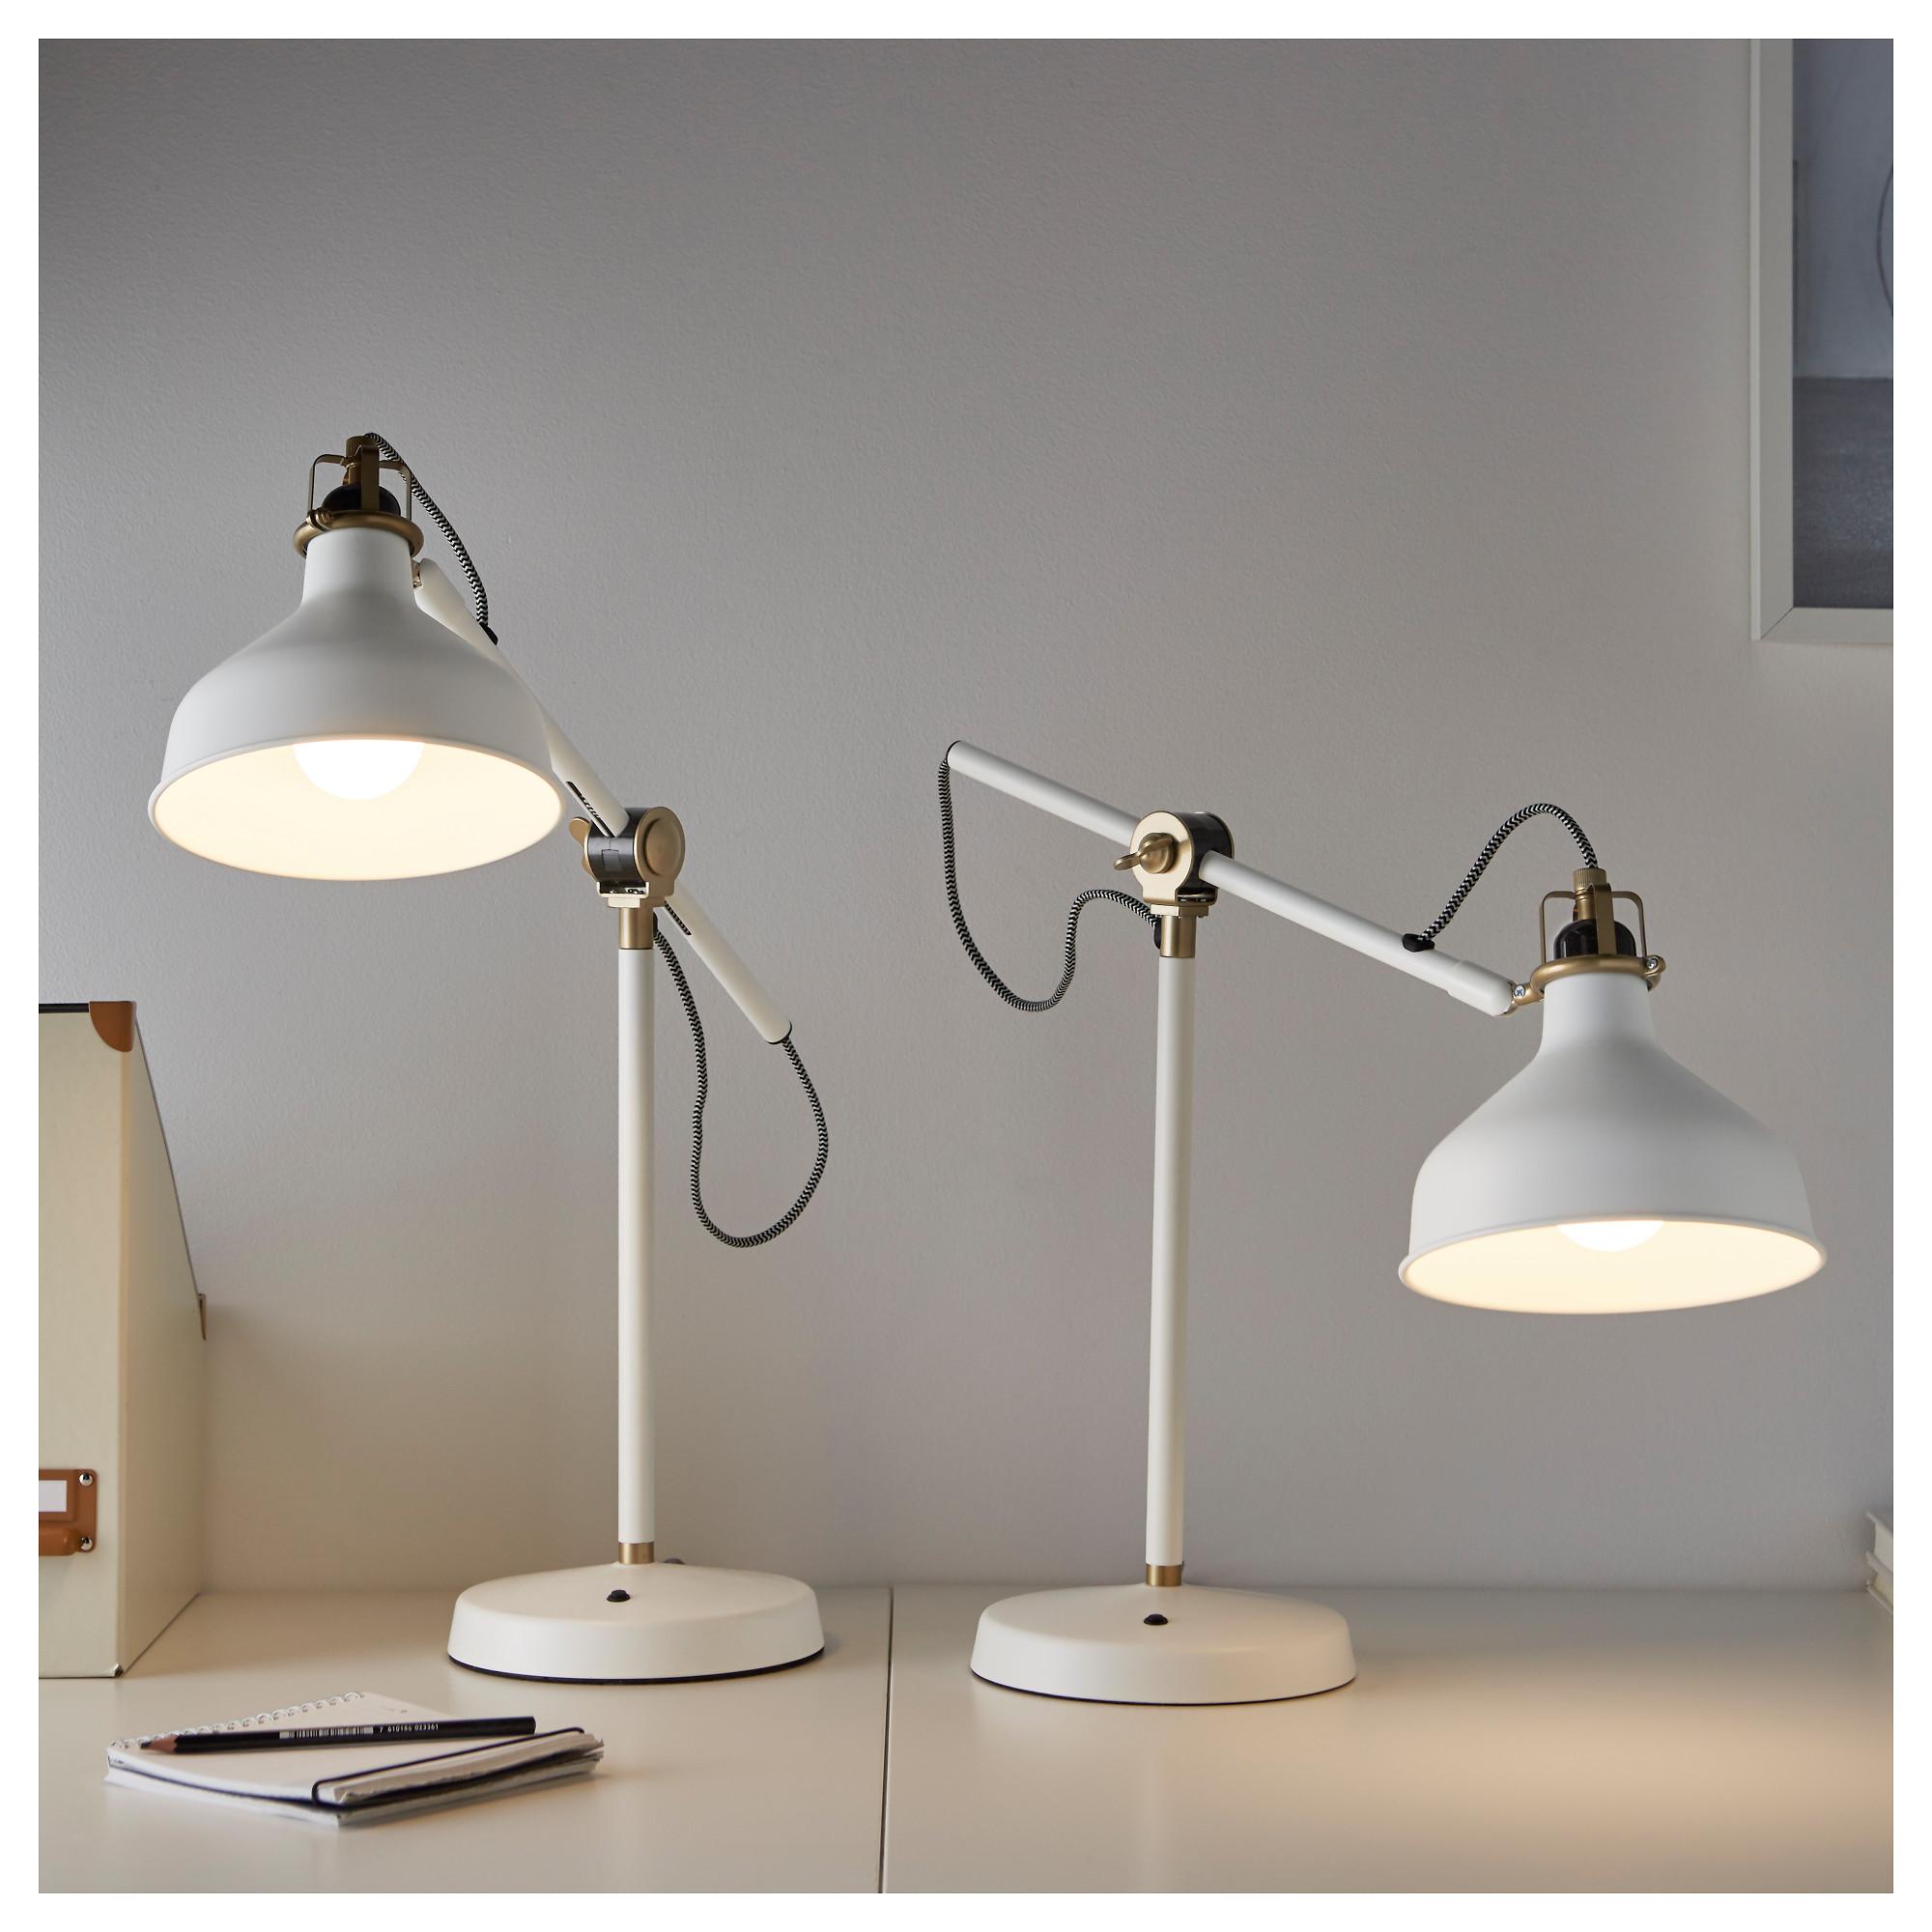 ranarp-work-lamp-off-white__0473989_pe614864_s5